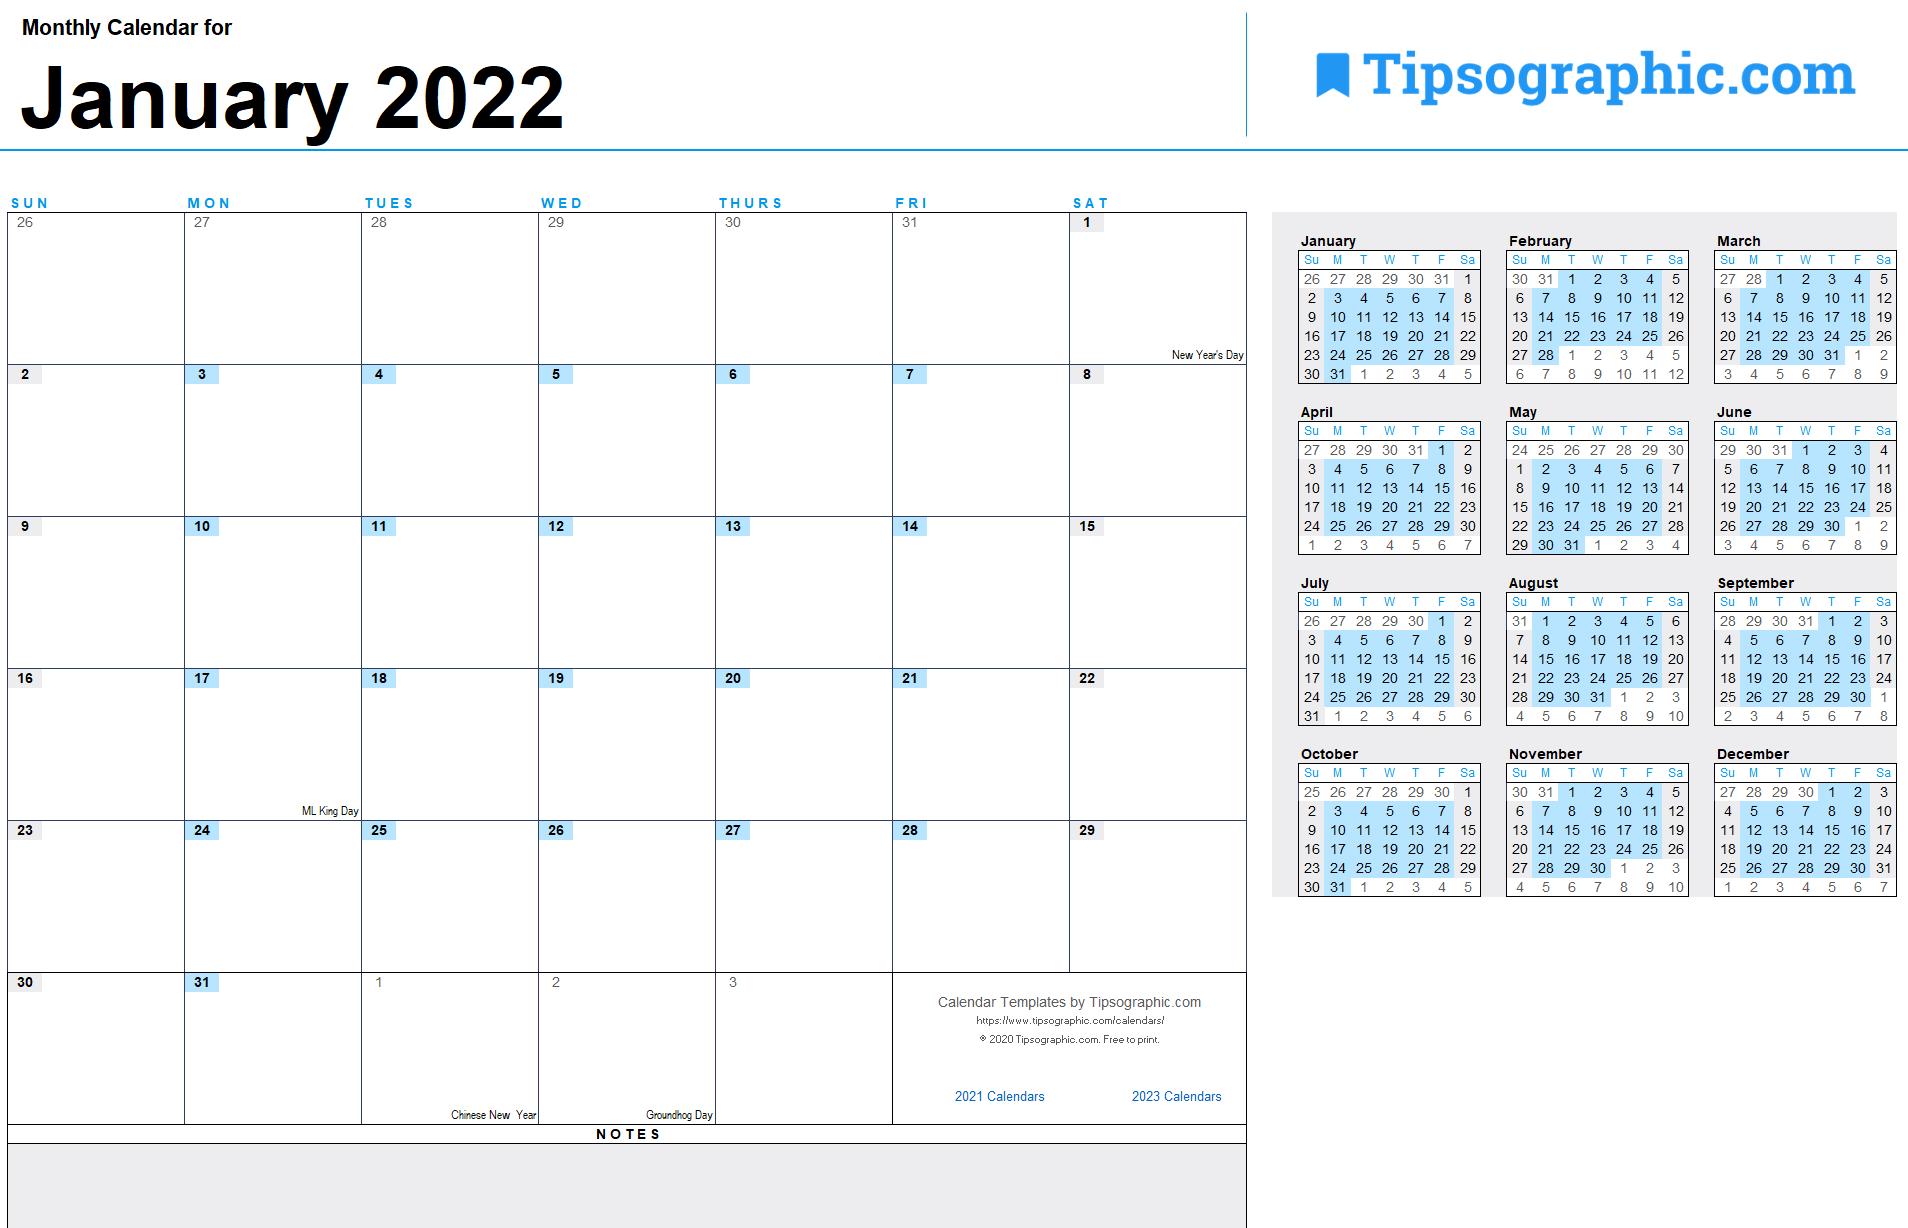 Tipsographic